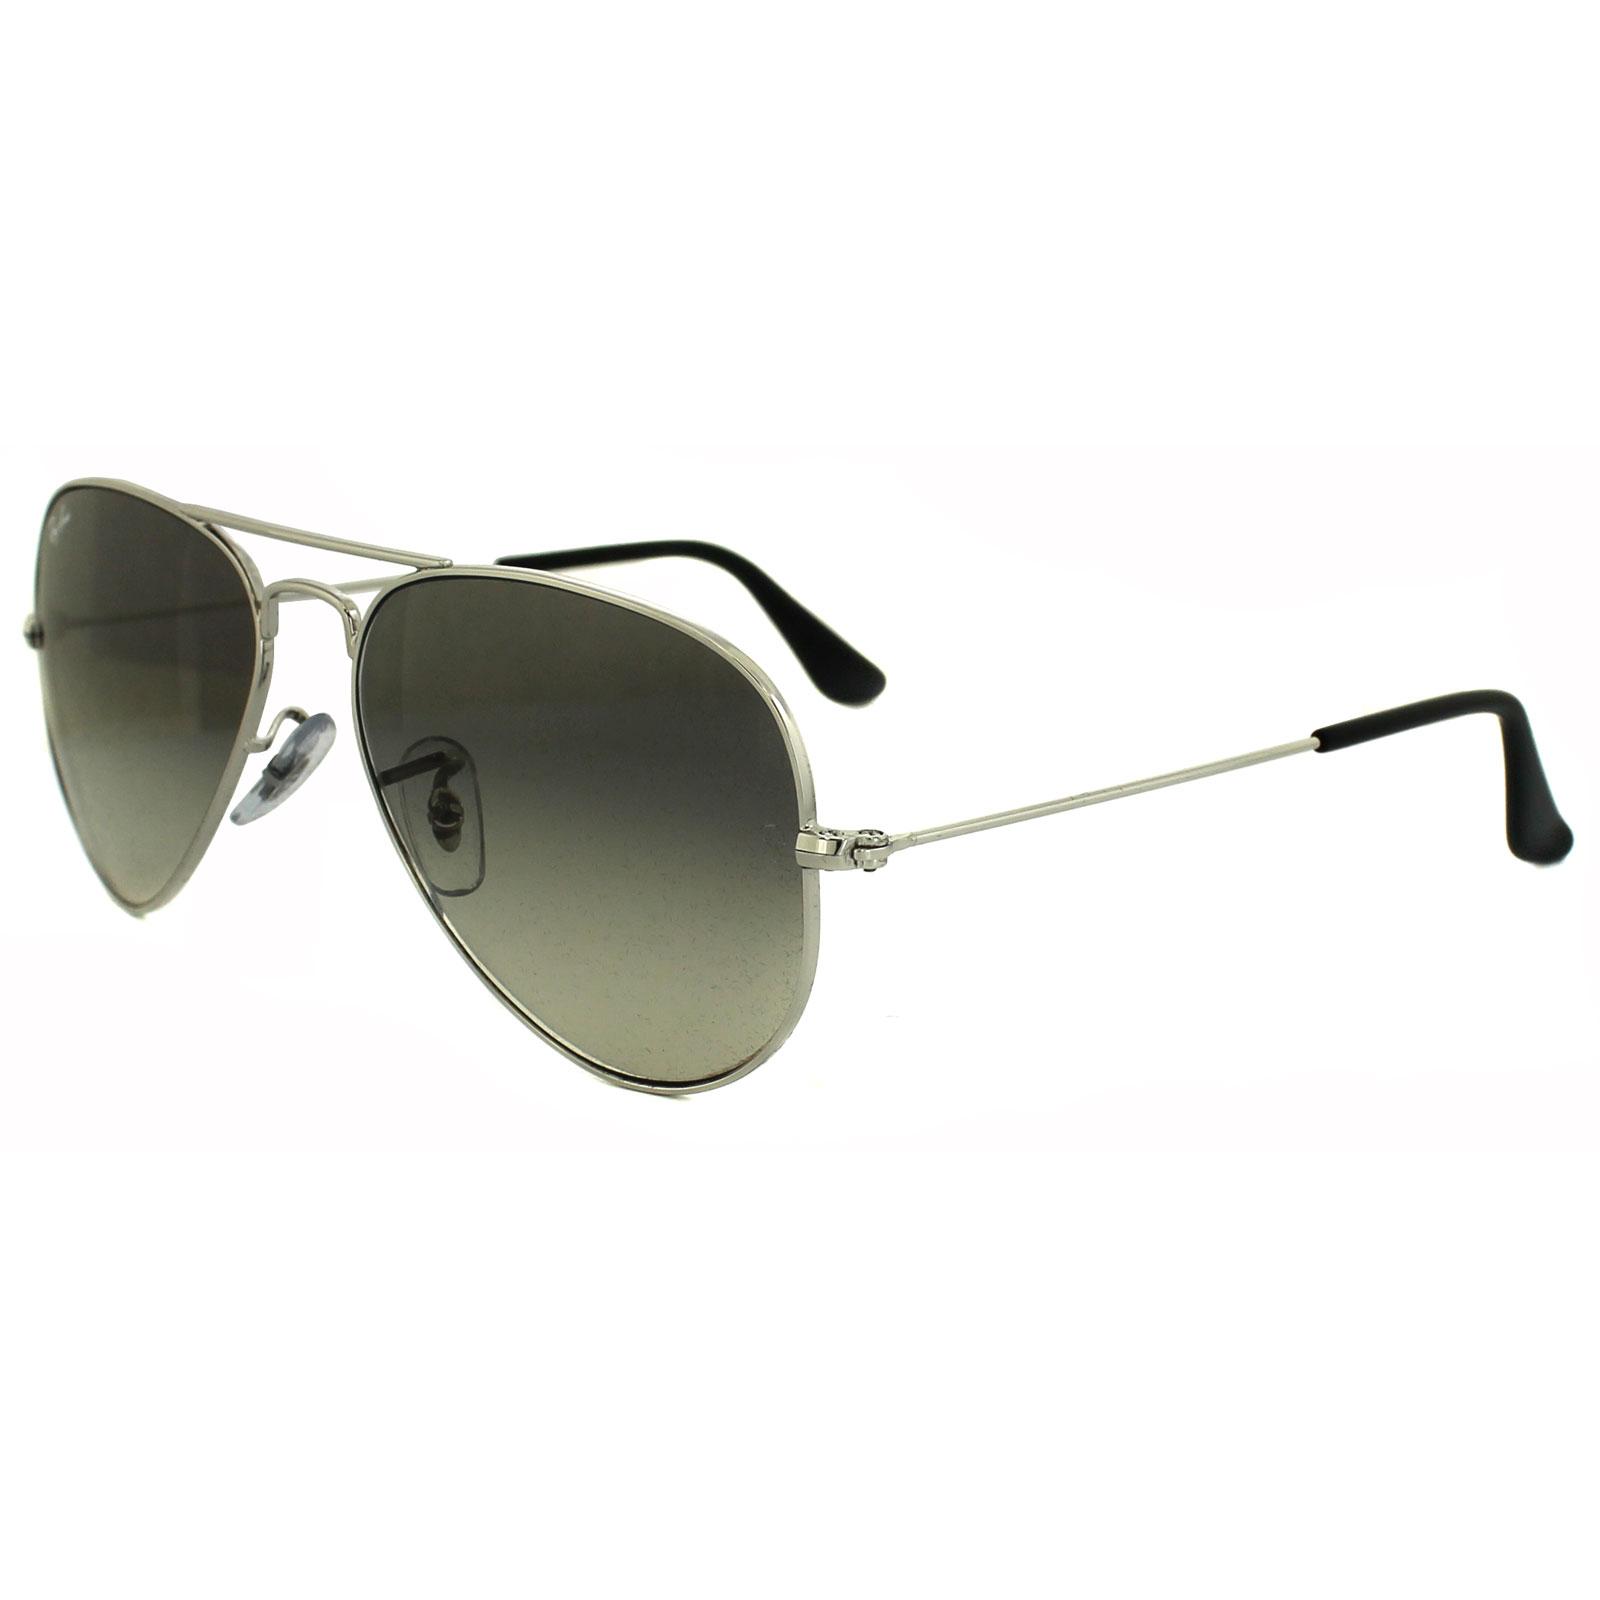 ray ban sonnenbrille aviator 3025 003 32 silver grey. Black Bedroom Furniture Sets. Home Design Ideas